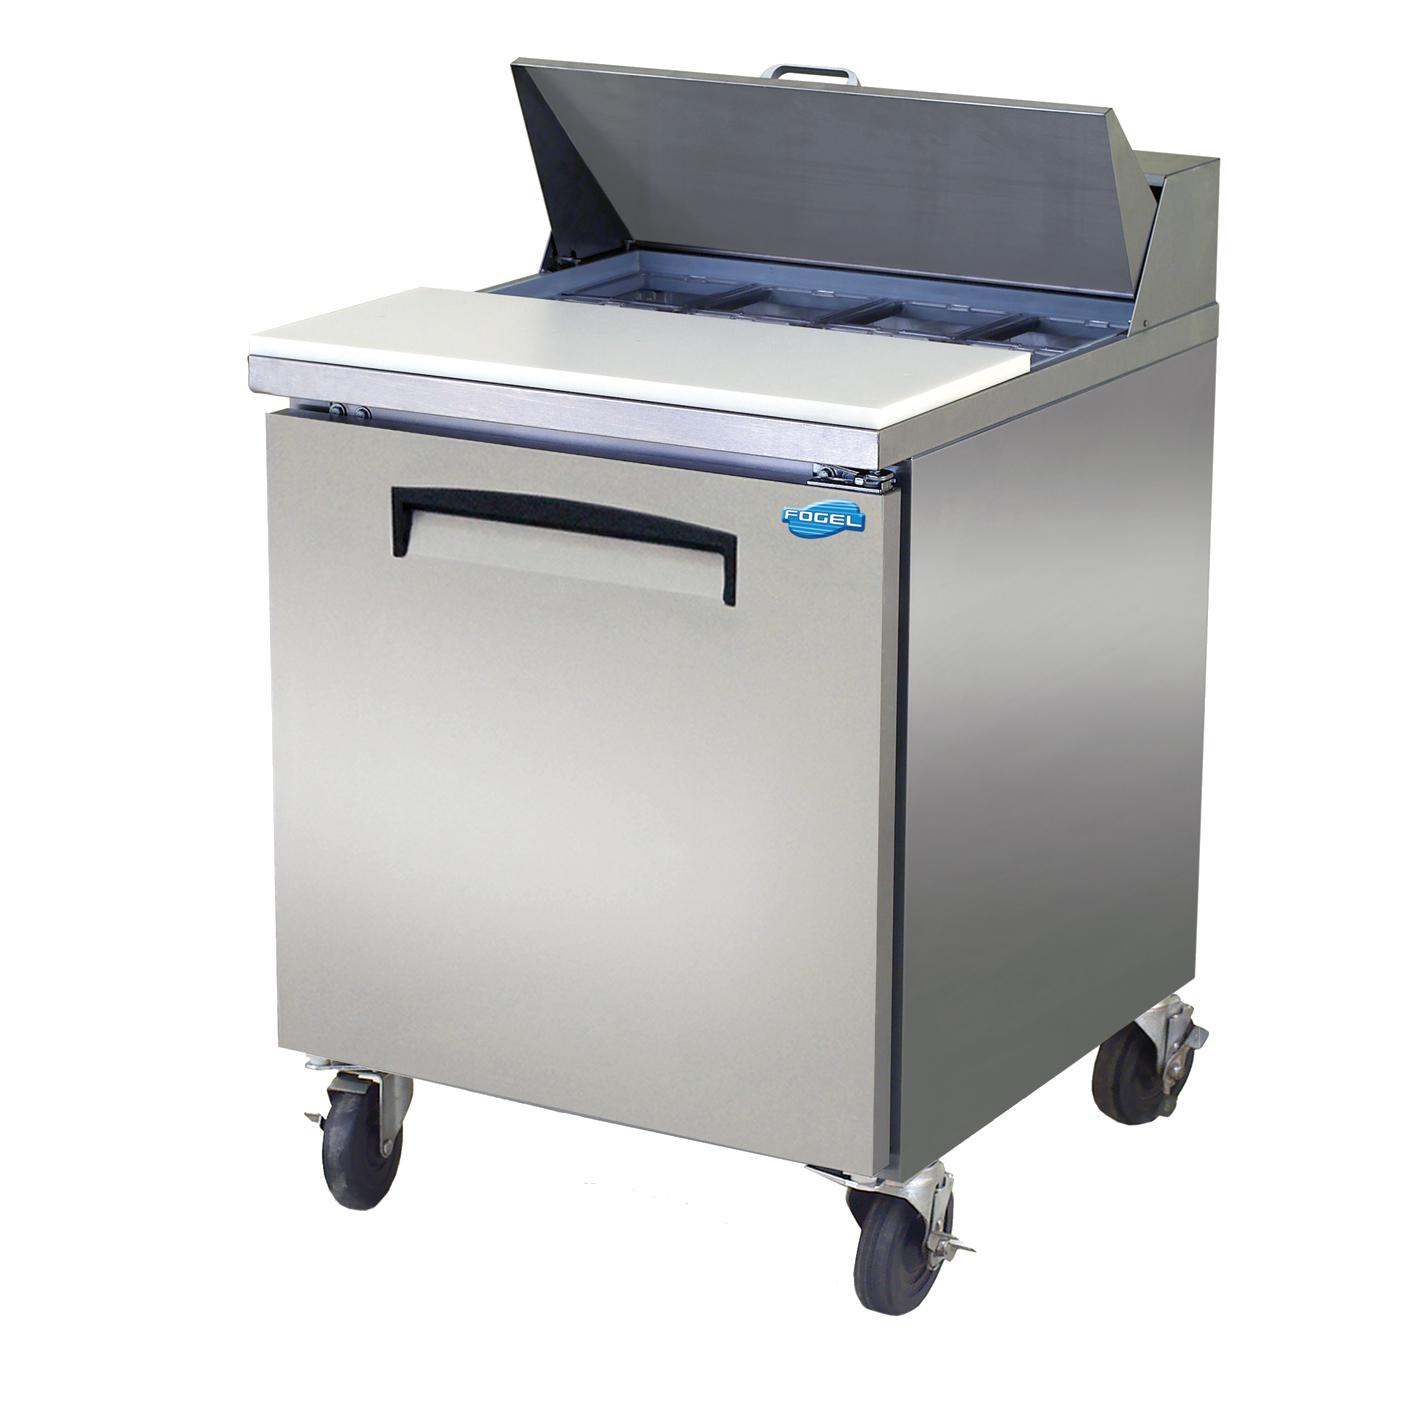 Fogel USA SFLP-27-12 refrigerated counter, mega top sandwich / salad unit